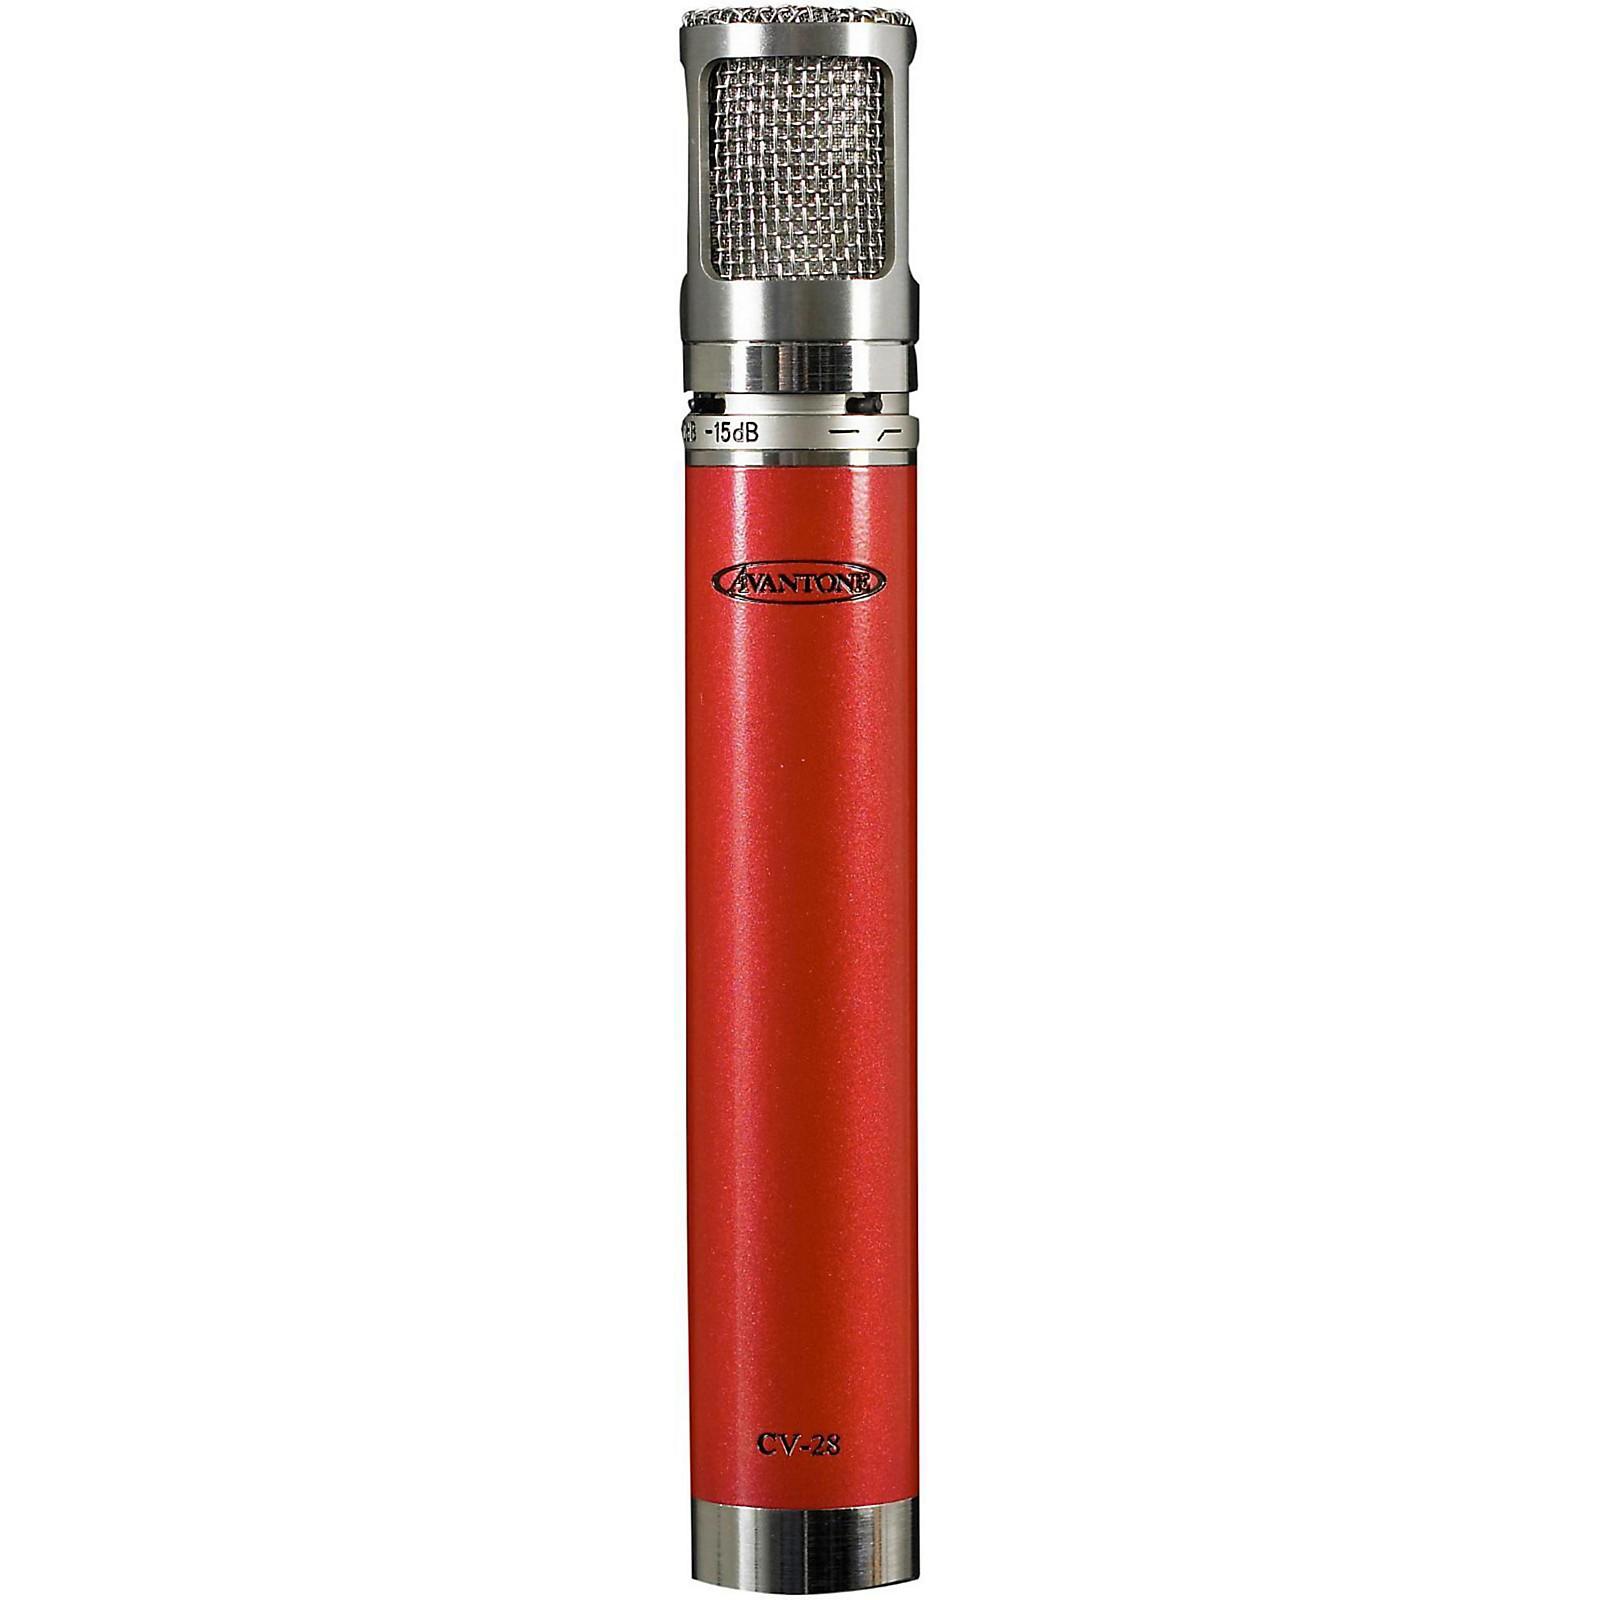 Avantone CV-28 Small-Capsule Tube Condenser Microphone